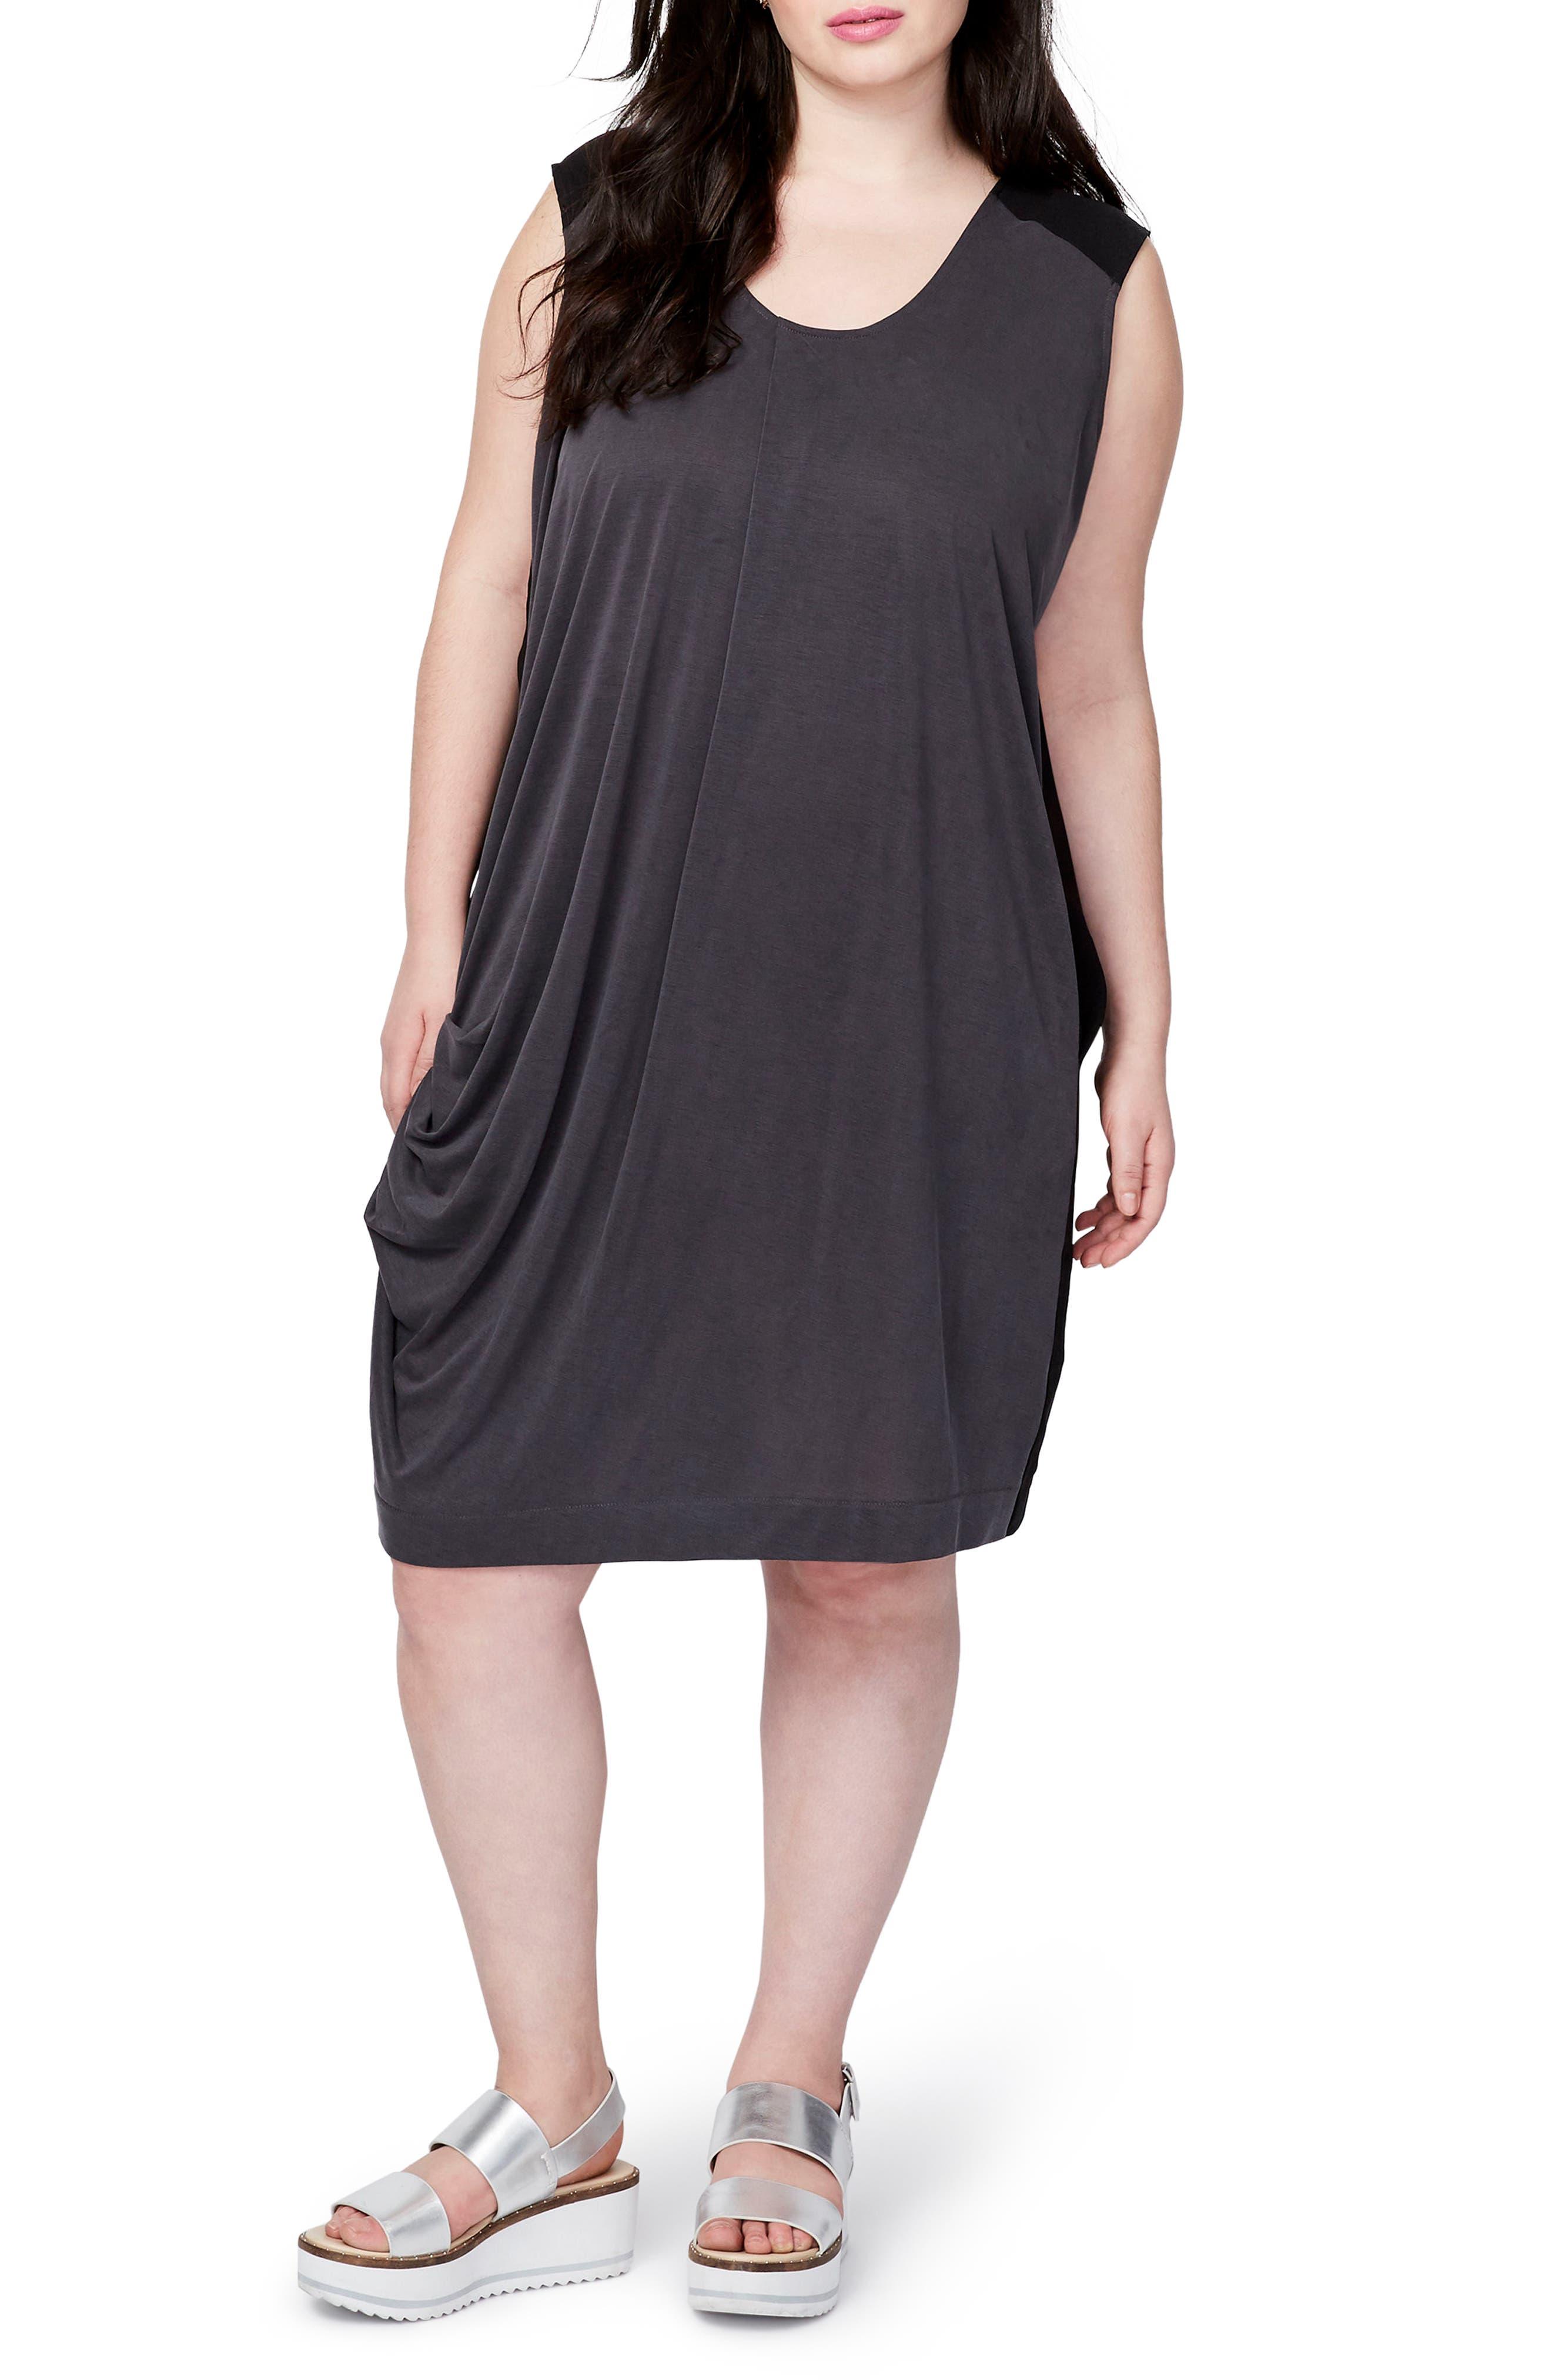 RACHEL RACHEL ROY Draped Colorblock Dress